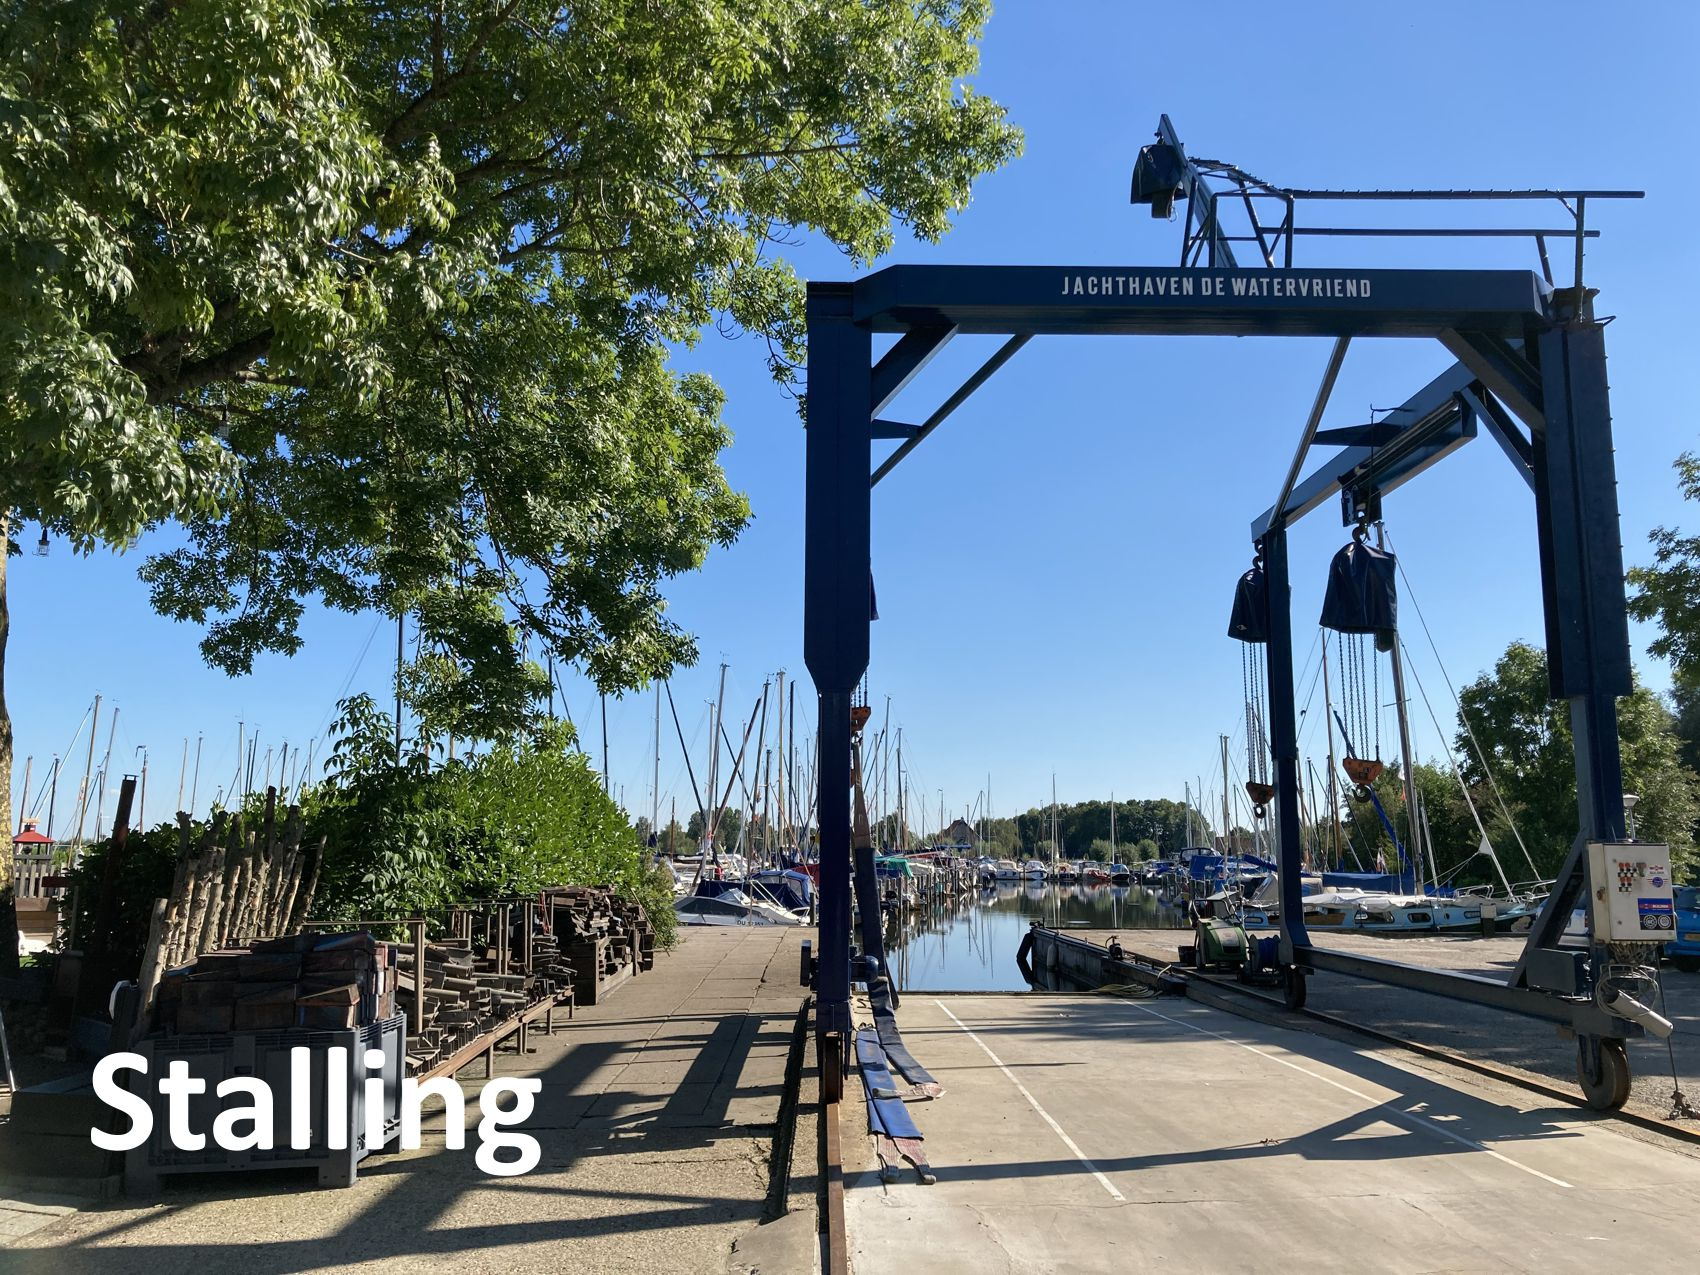 Stalling_Onderhoud_Klussen_Jachthaven_de_Watervriend_Friesland